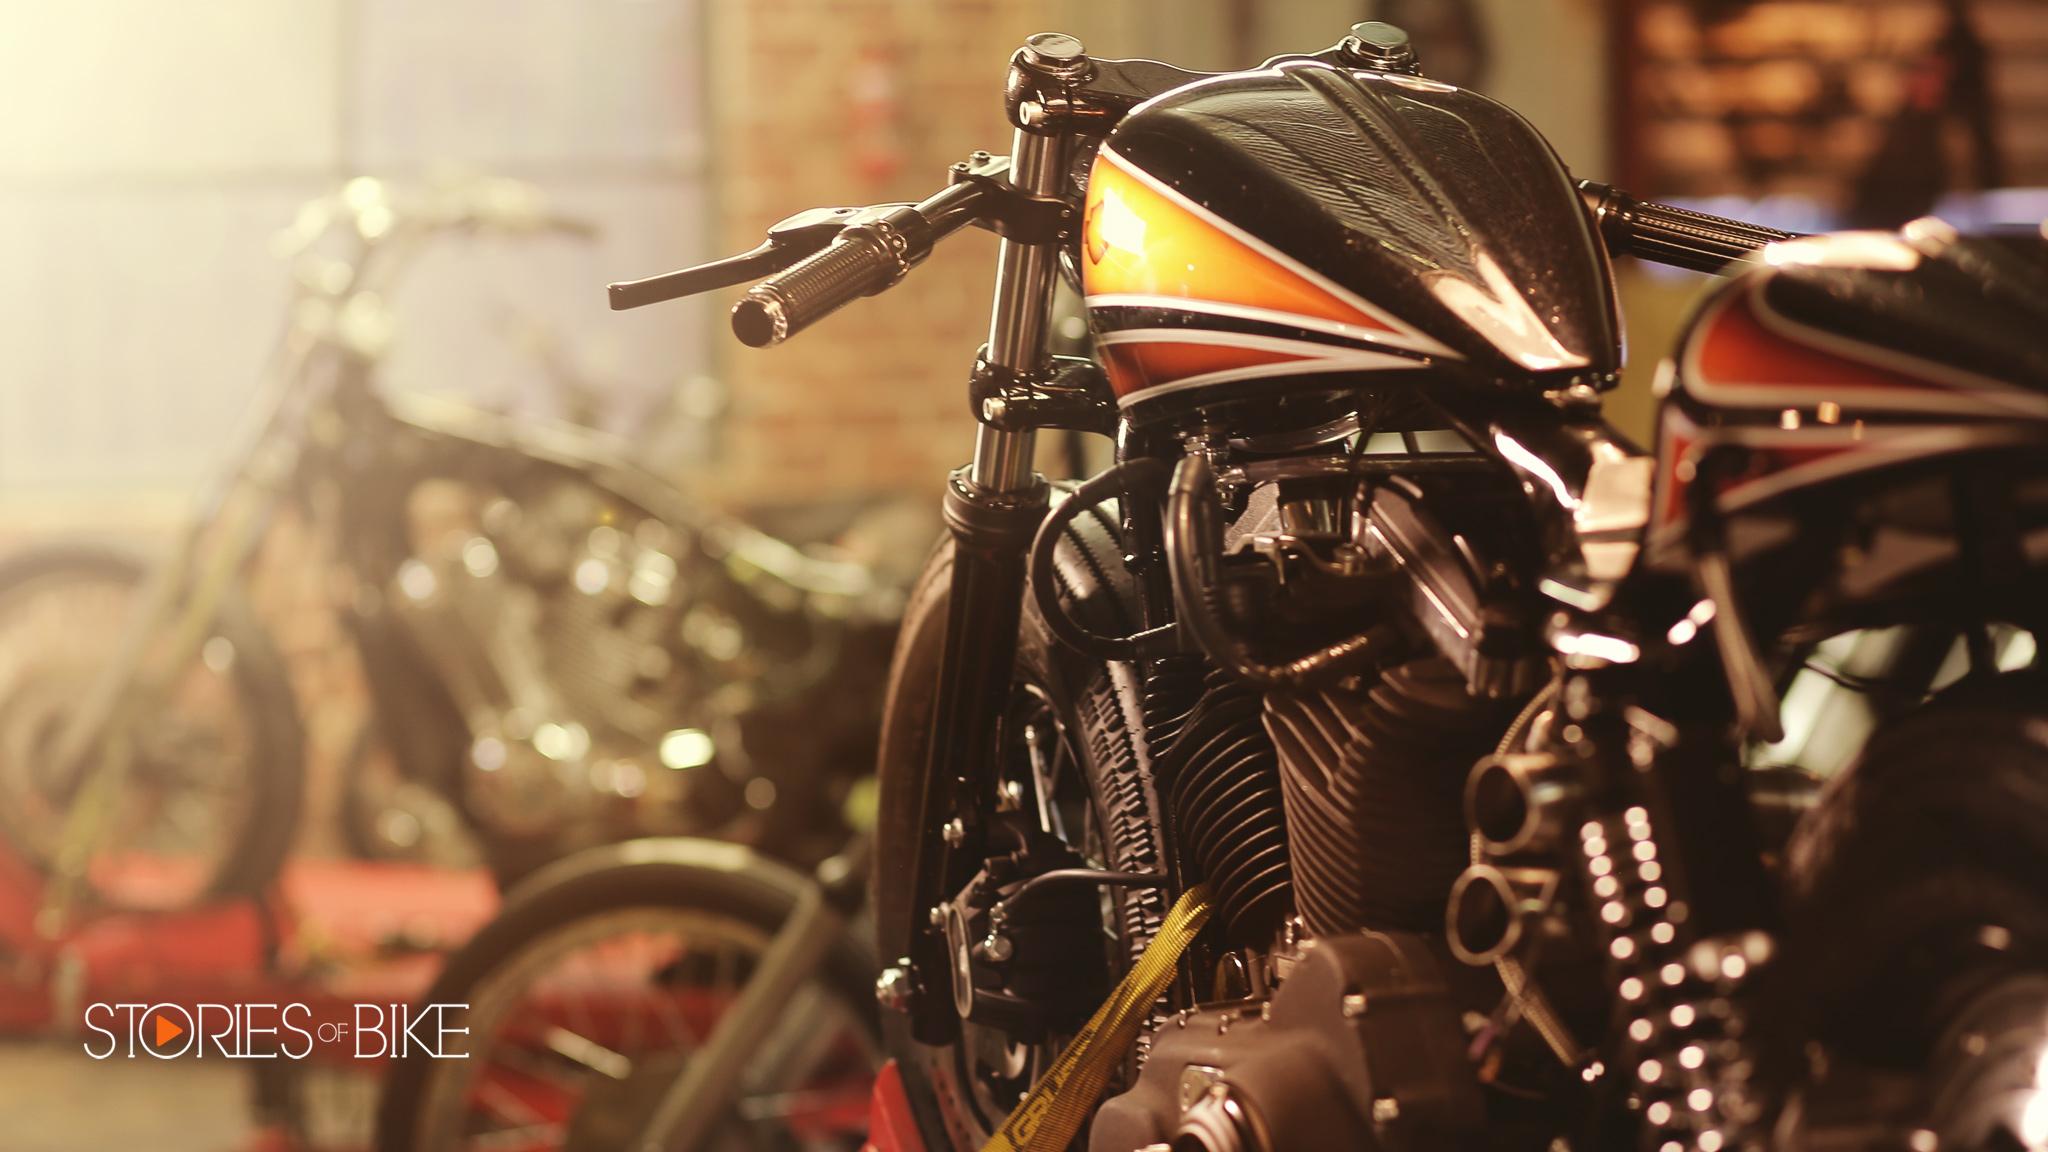 Stories_of_Bike_TwoCities_KK_Part3_1.jpg